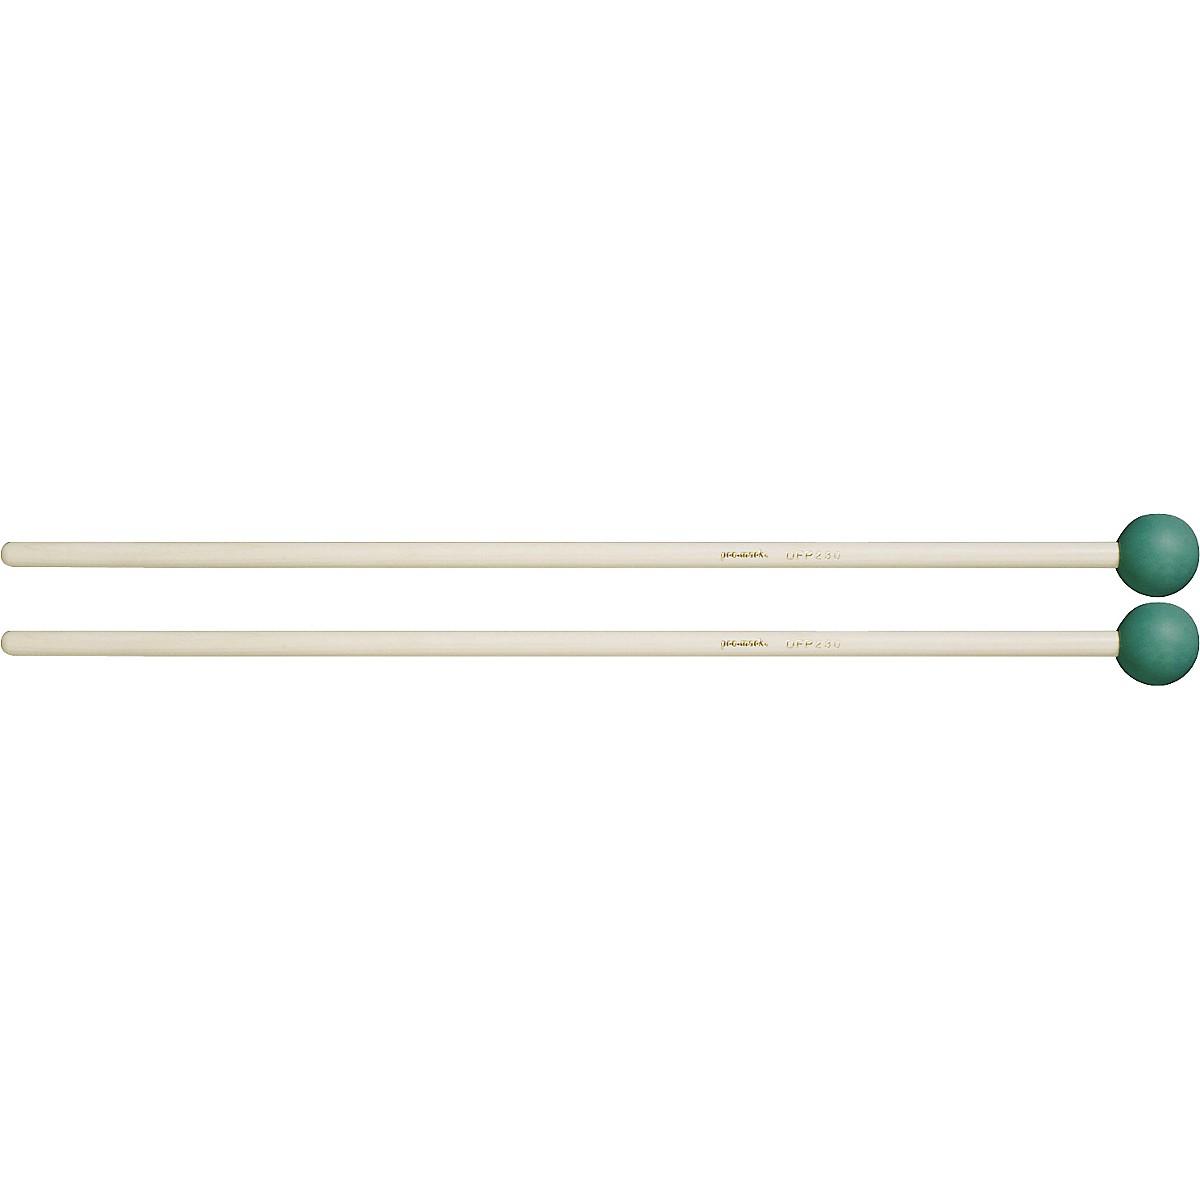 Promark Dan Fyffe Educational Series Mallets Dfp710 Birch Handle With Extra-Soft Yarn Head